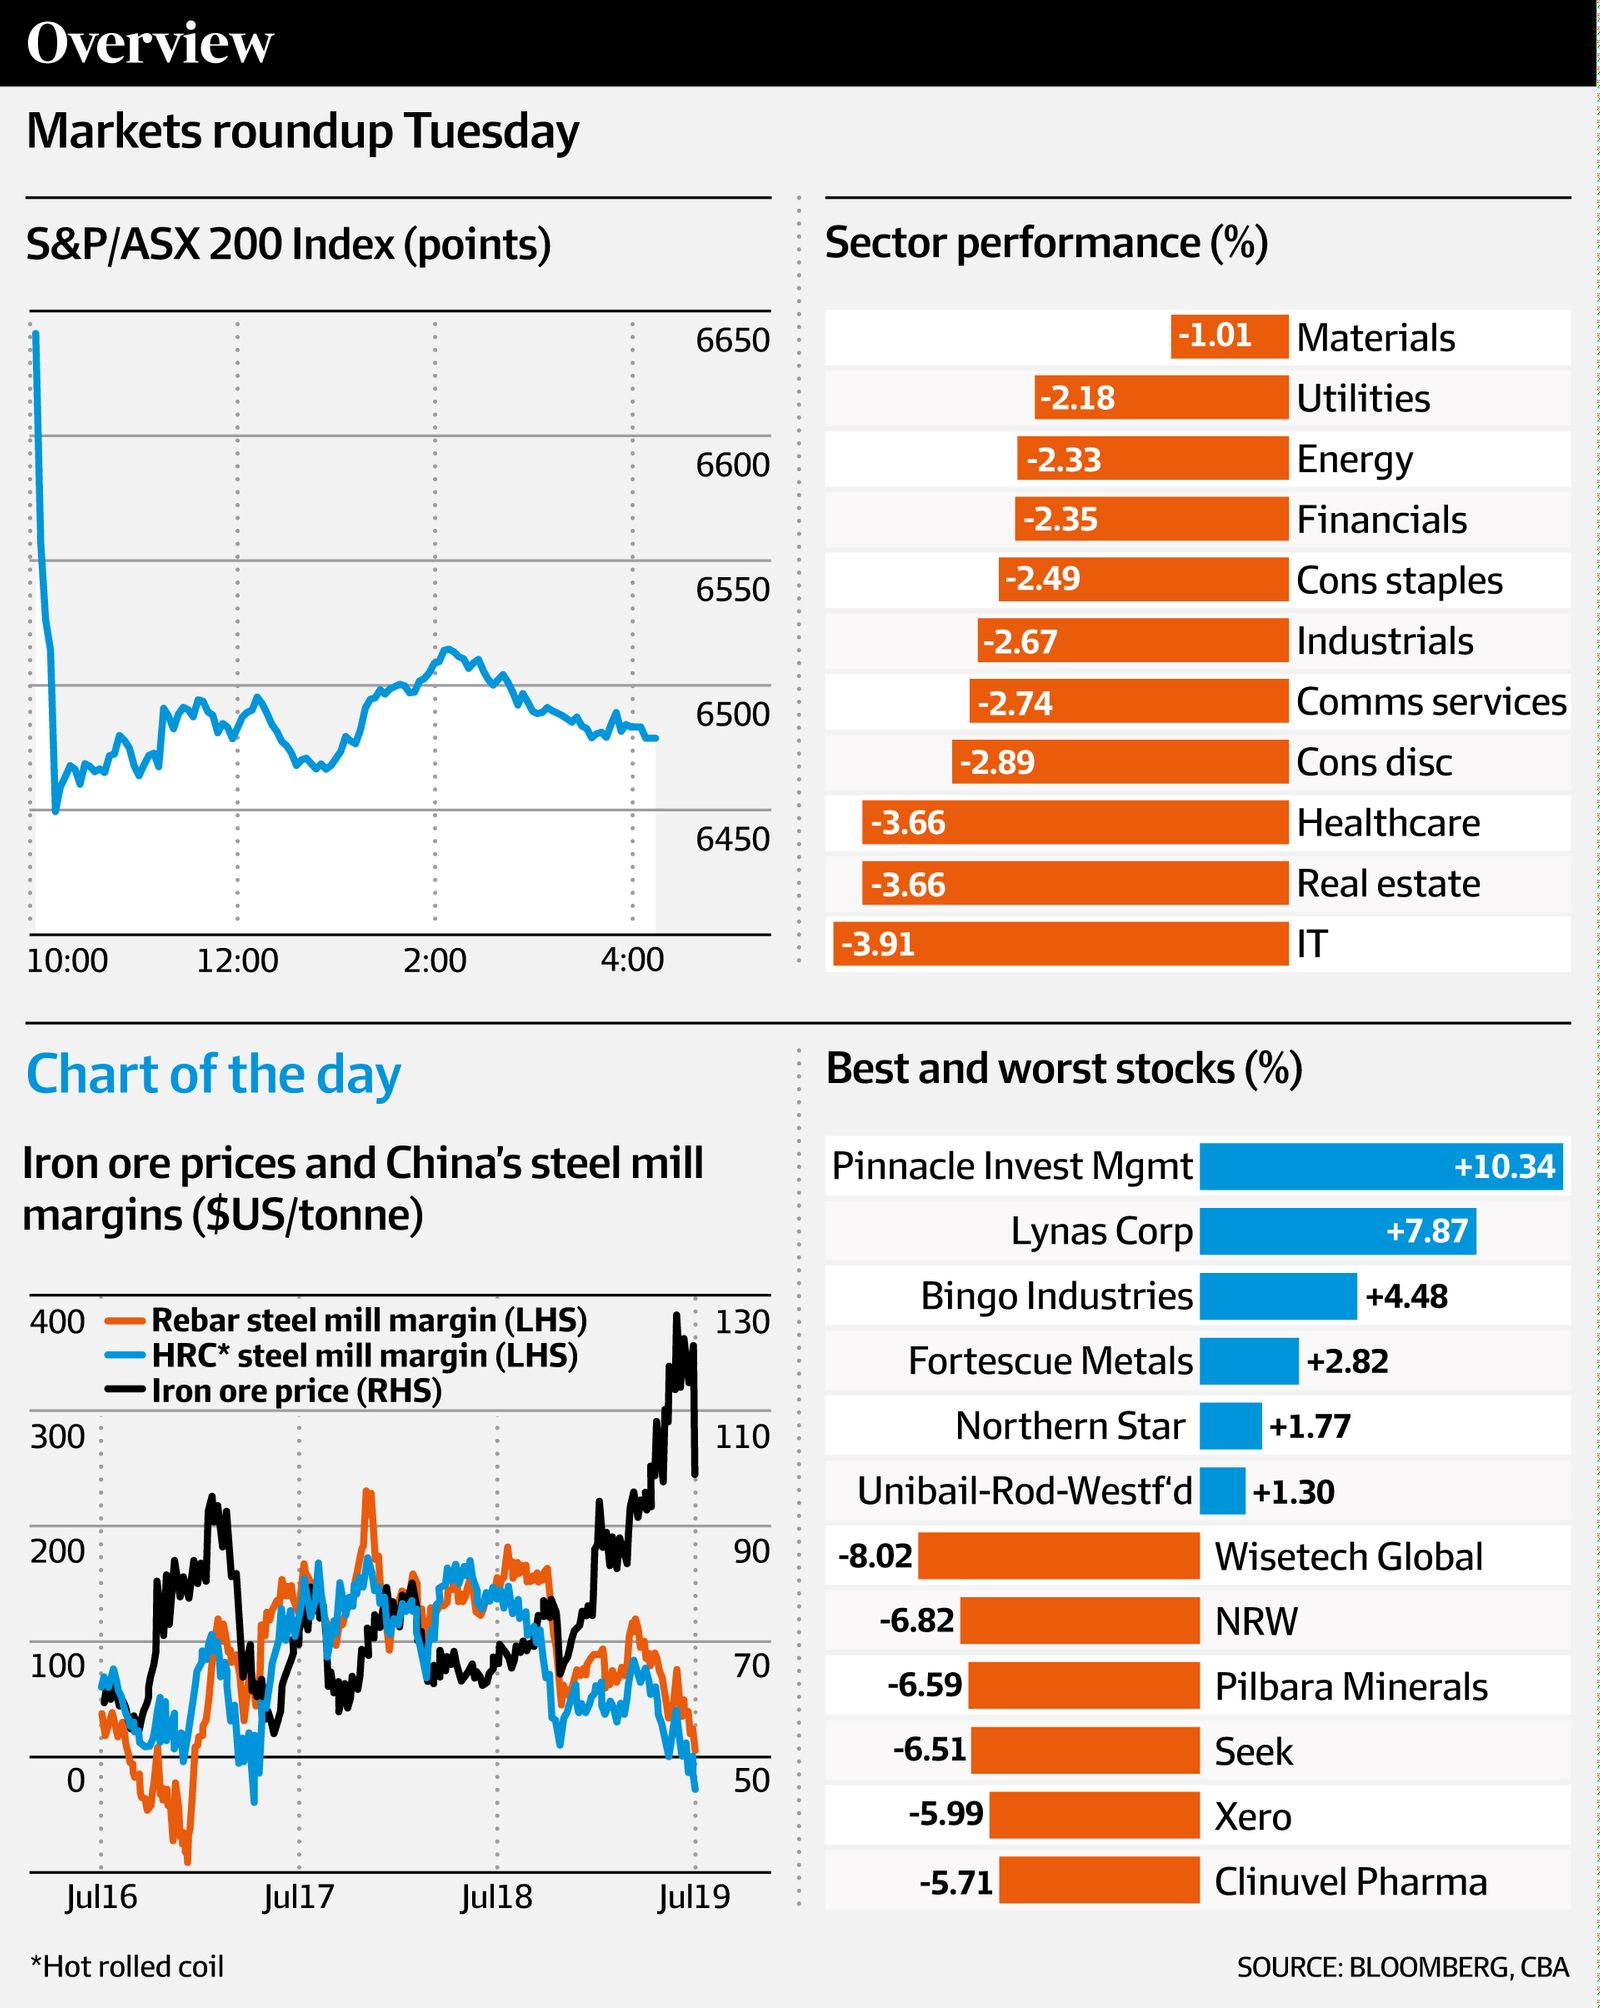 Markets roundup Tuesday (CBA, AFR)